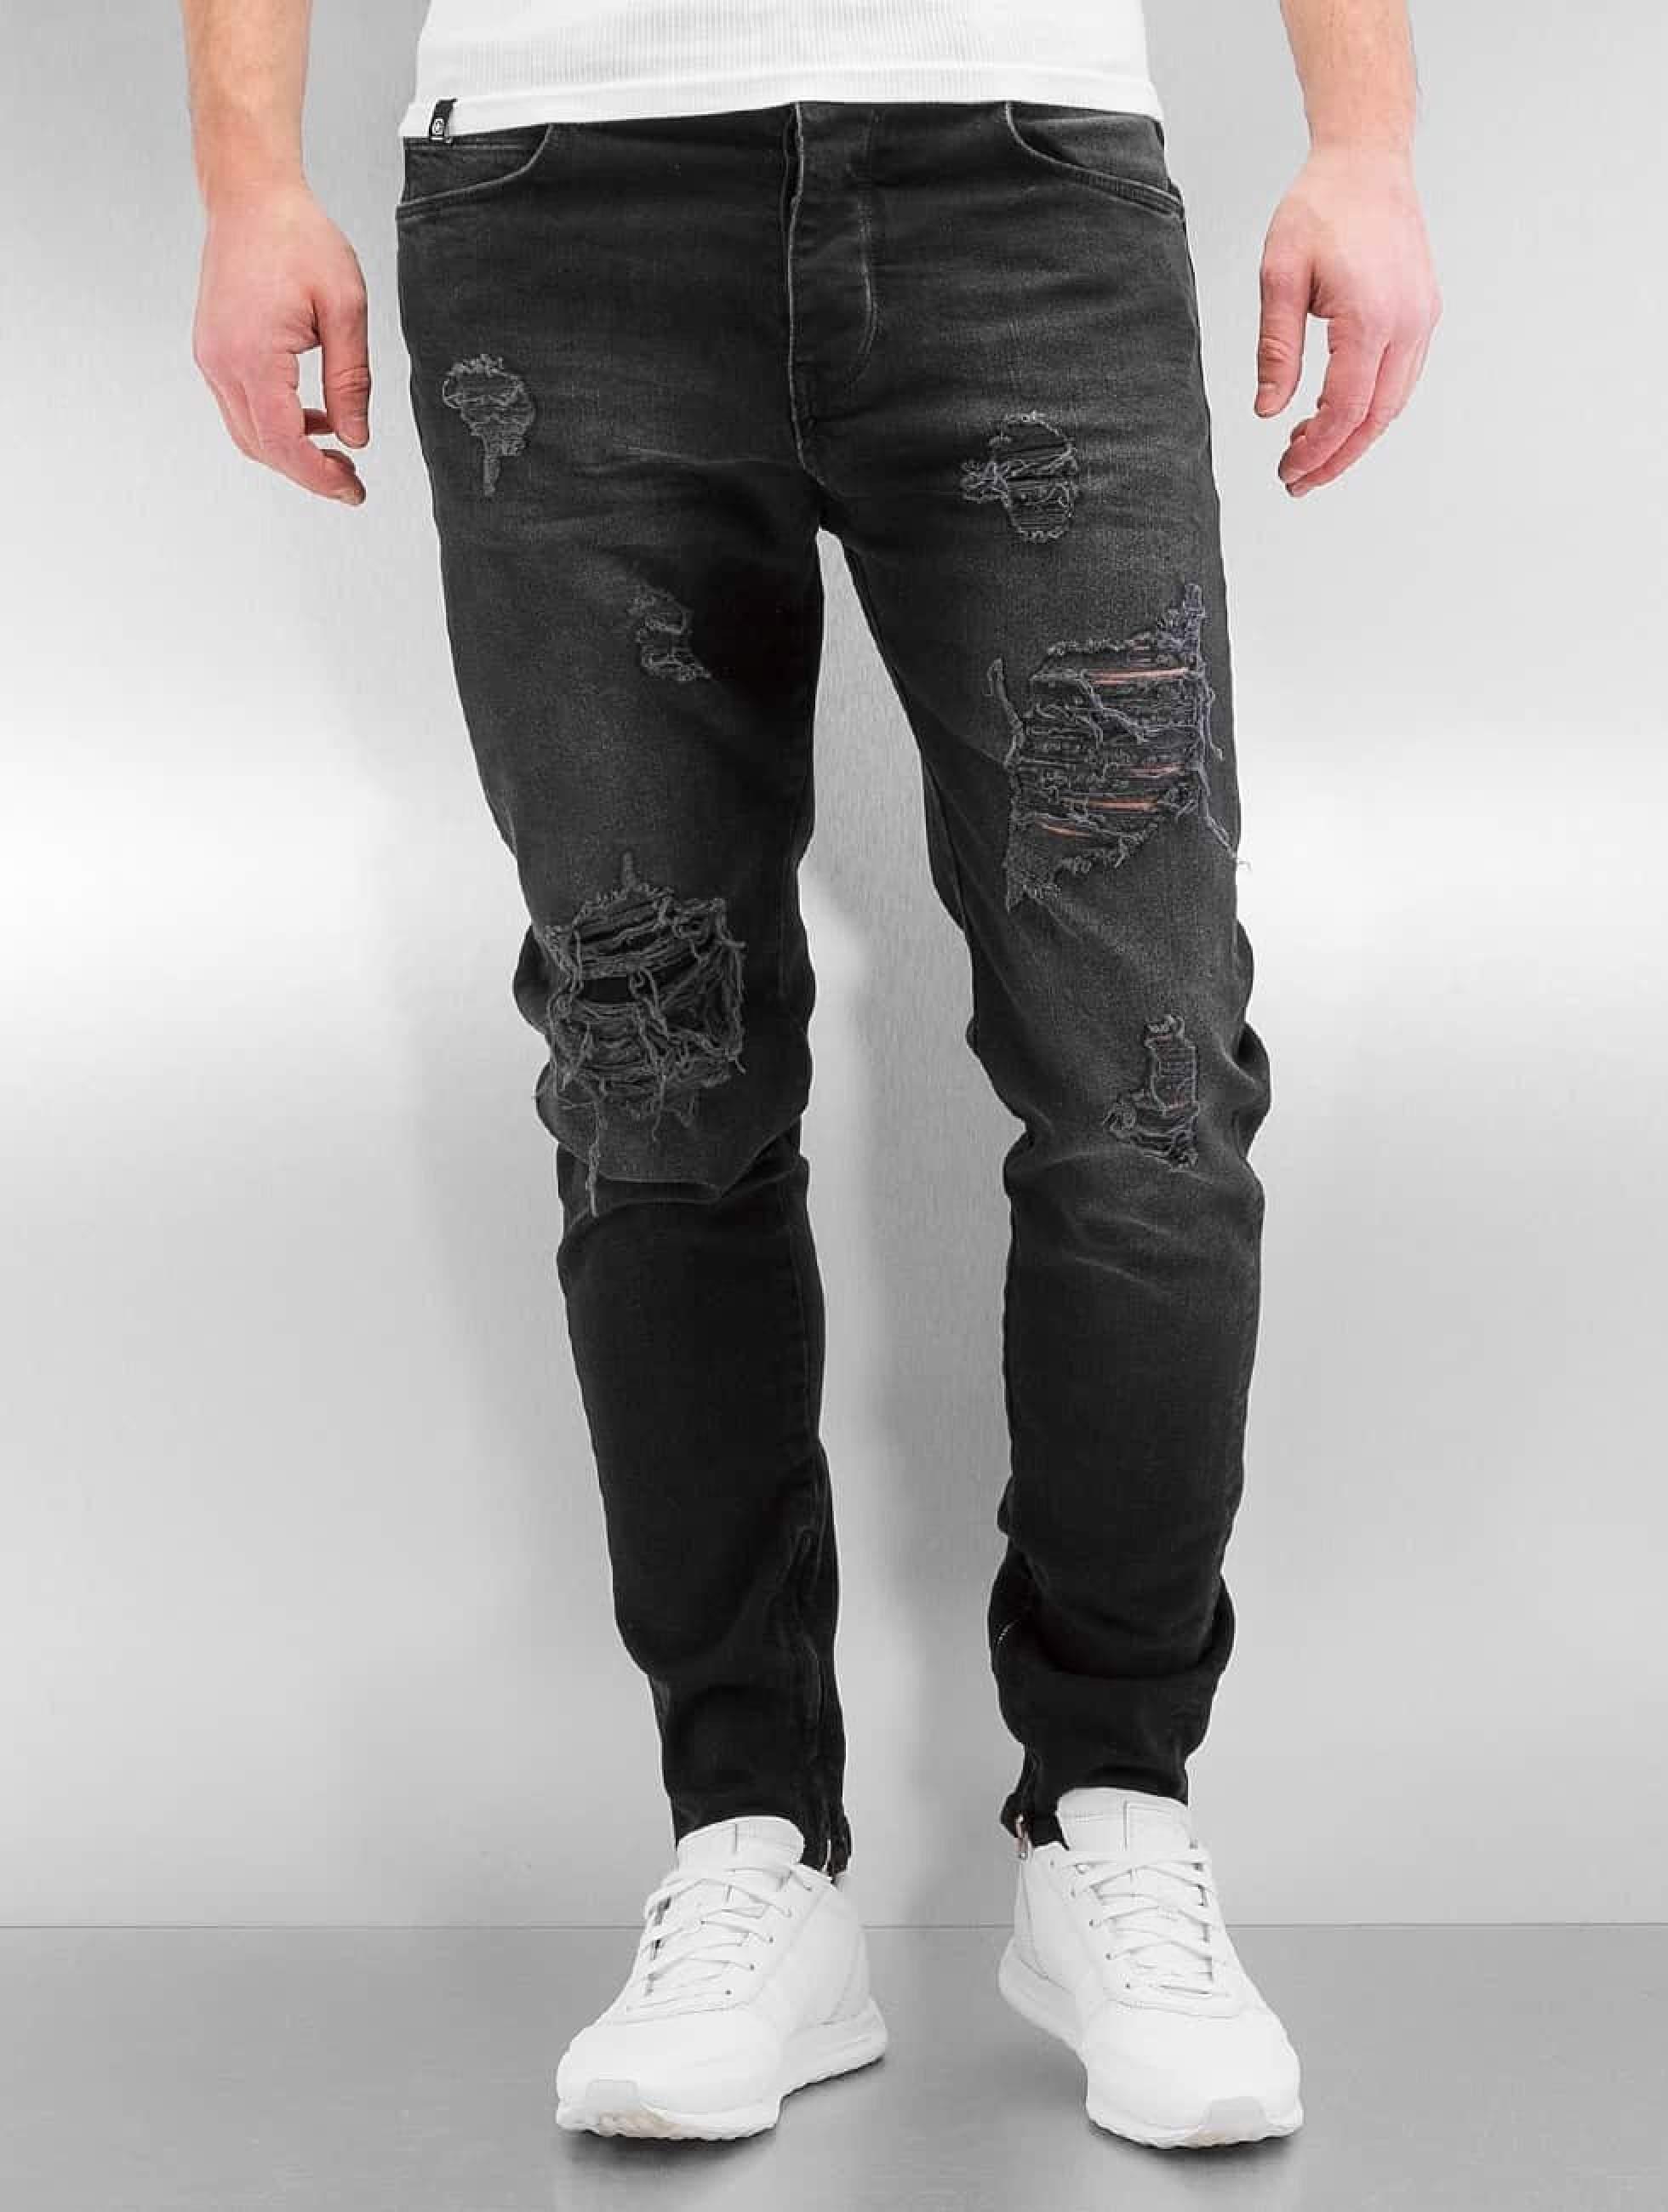 Bangastic / Slim Fit Jeans K125 in black W 31